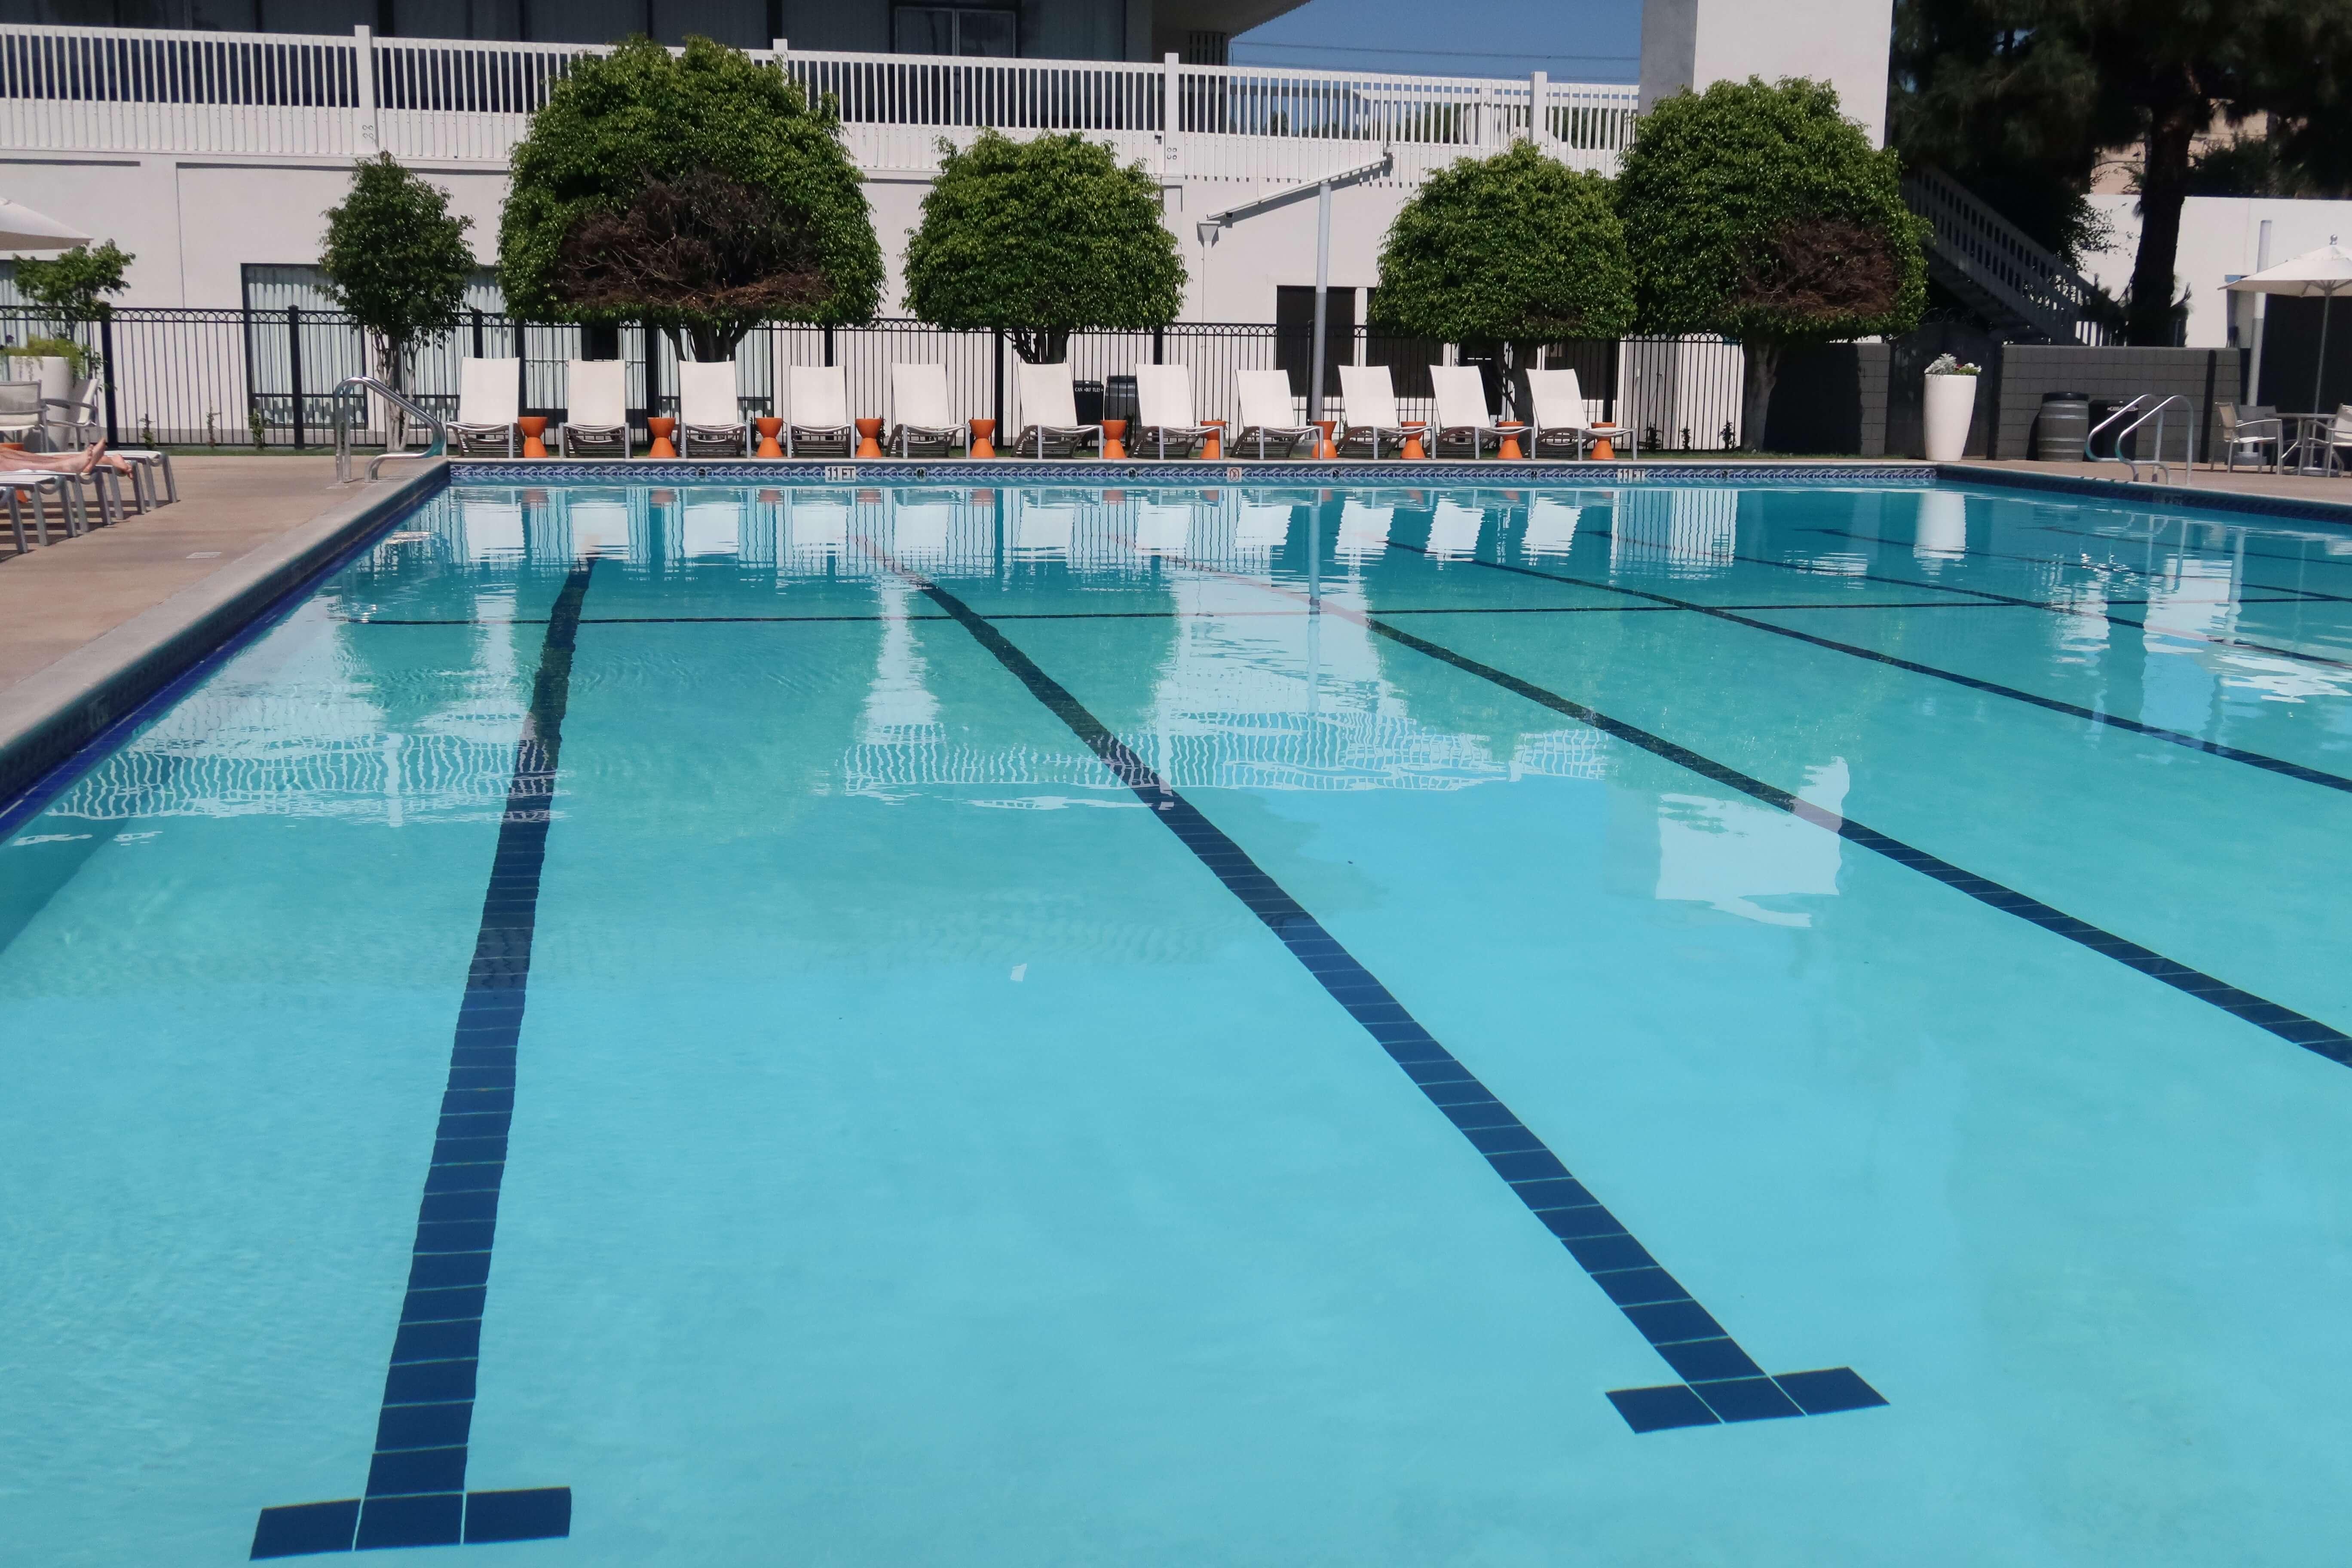 The Anaheim Hotel pool within walking distance of Disneyland